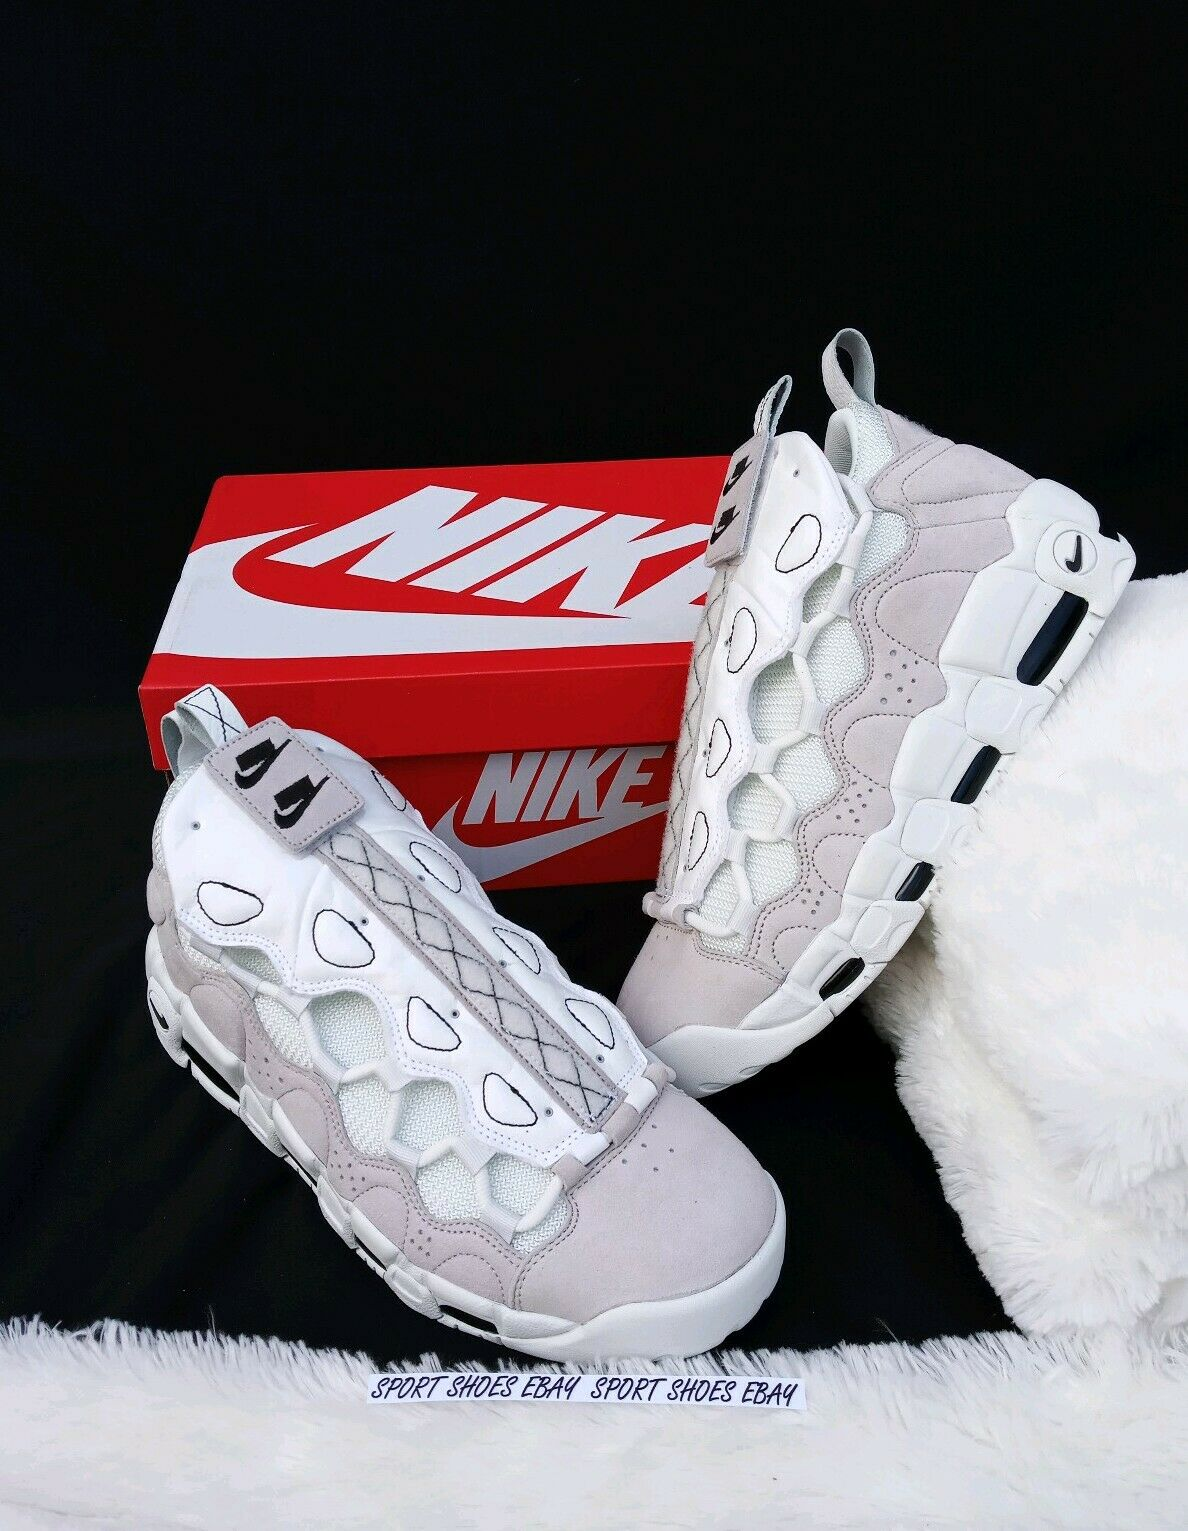 SIZE 10 MEN'S NIKE Air More Money AS QS All Star Vast Grey WhiteAQ0112 001